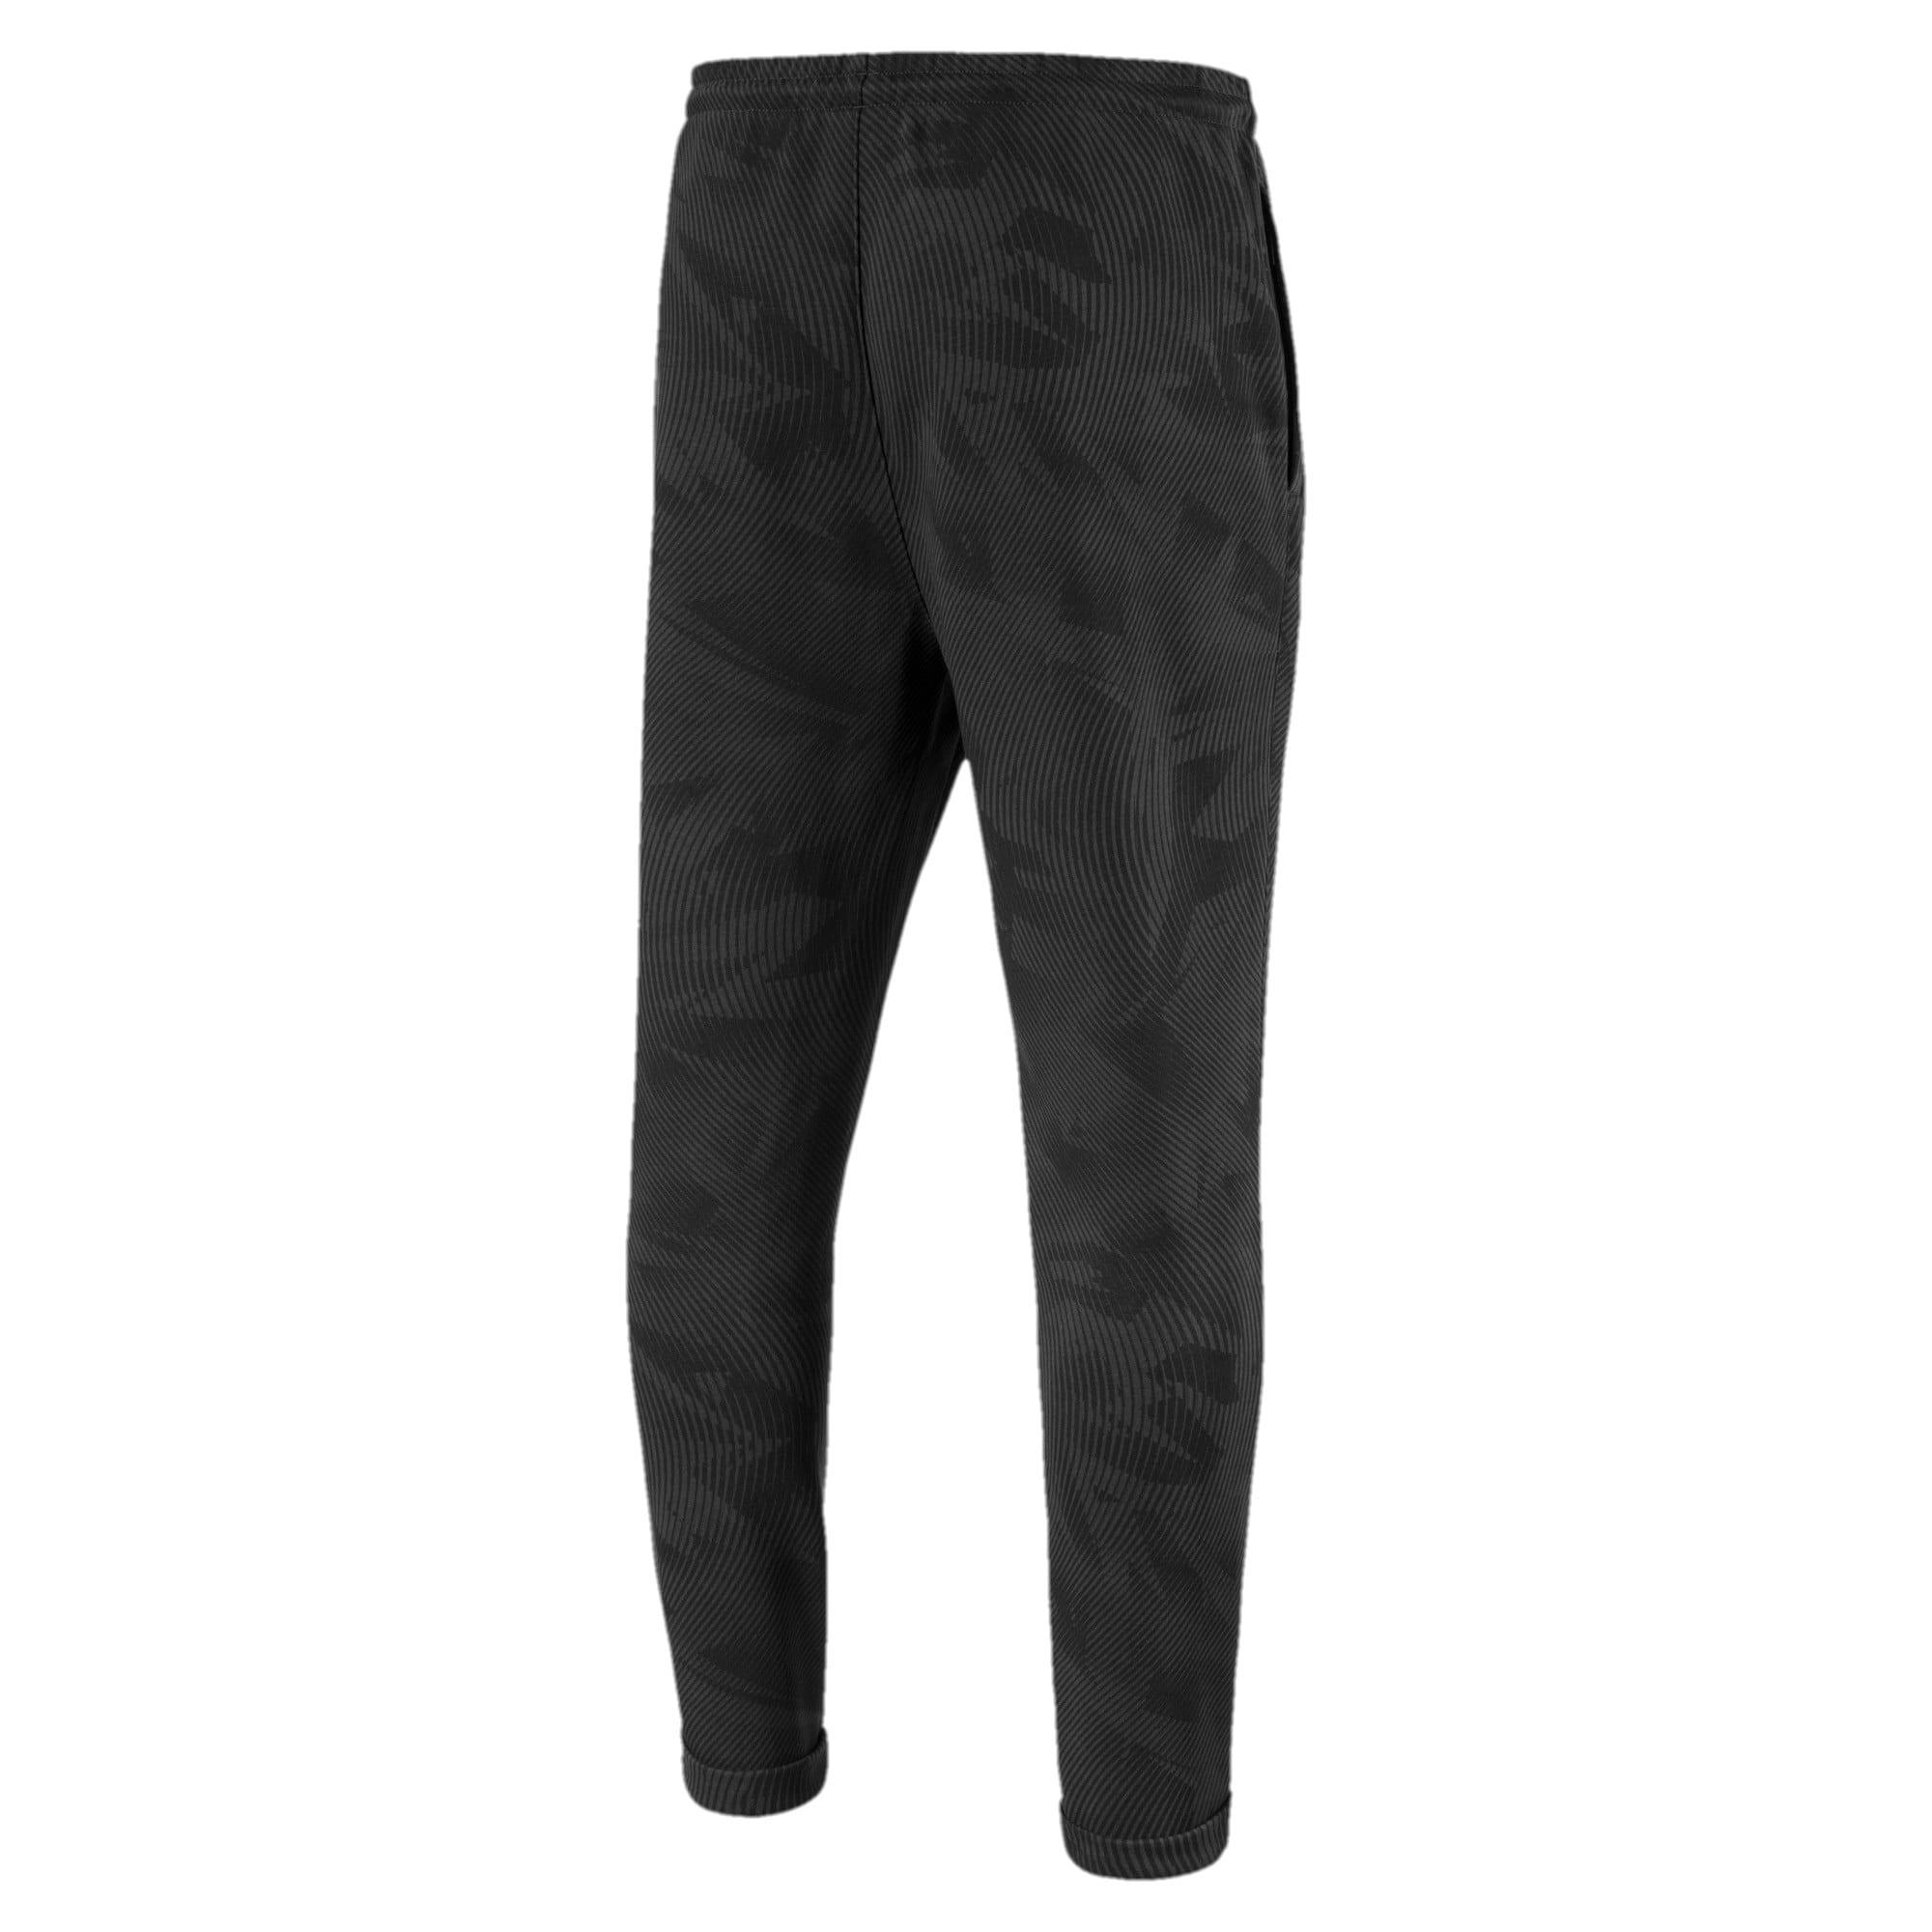 Thumbnail 5 of BVB Men's Casual Pants, Puma Black-Phantom Black, medium